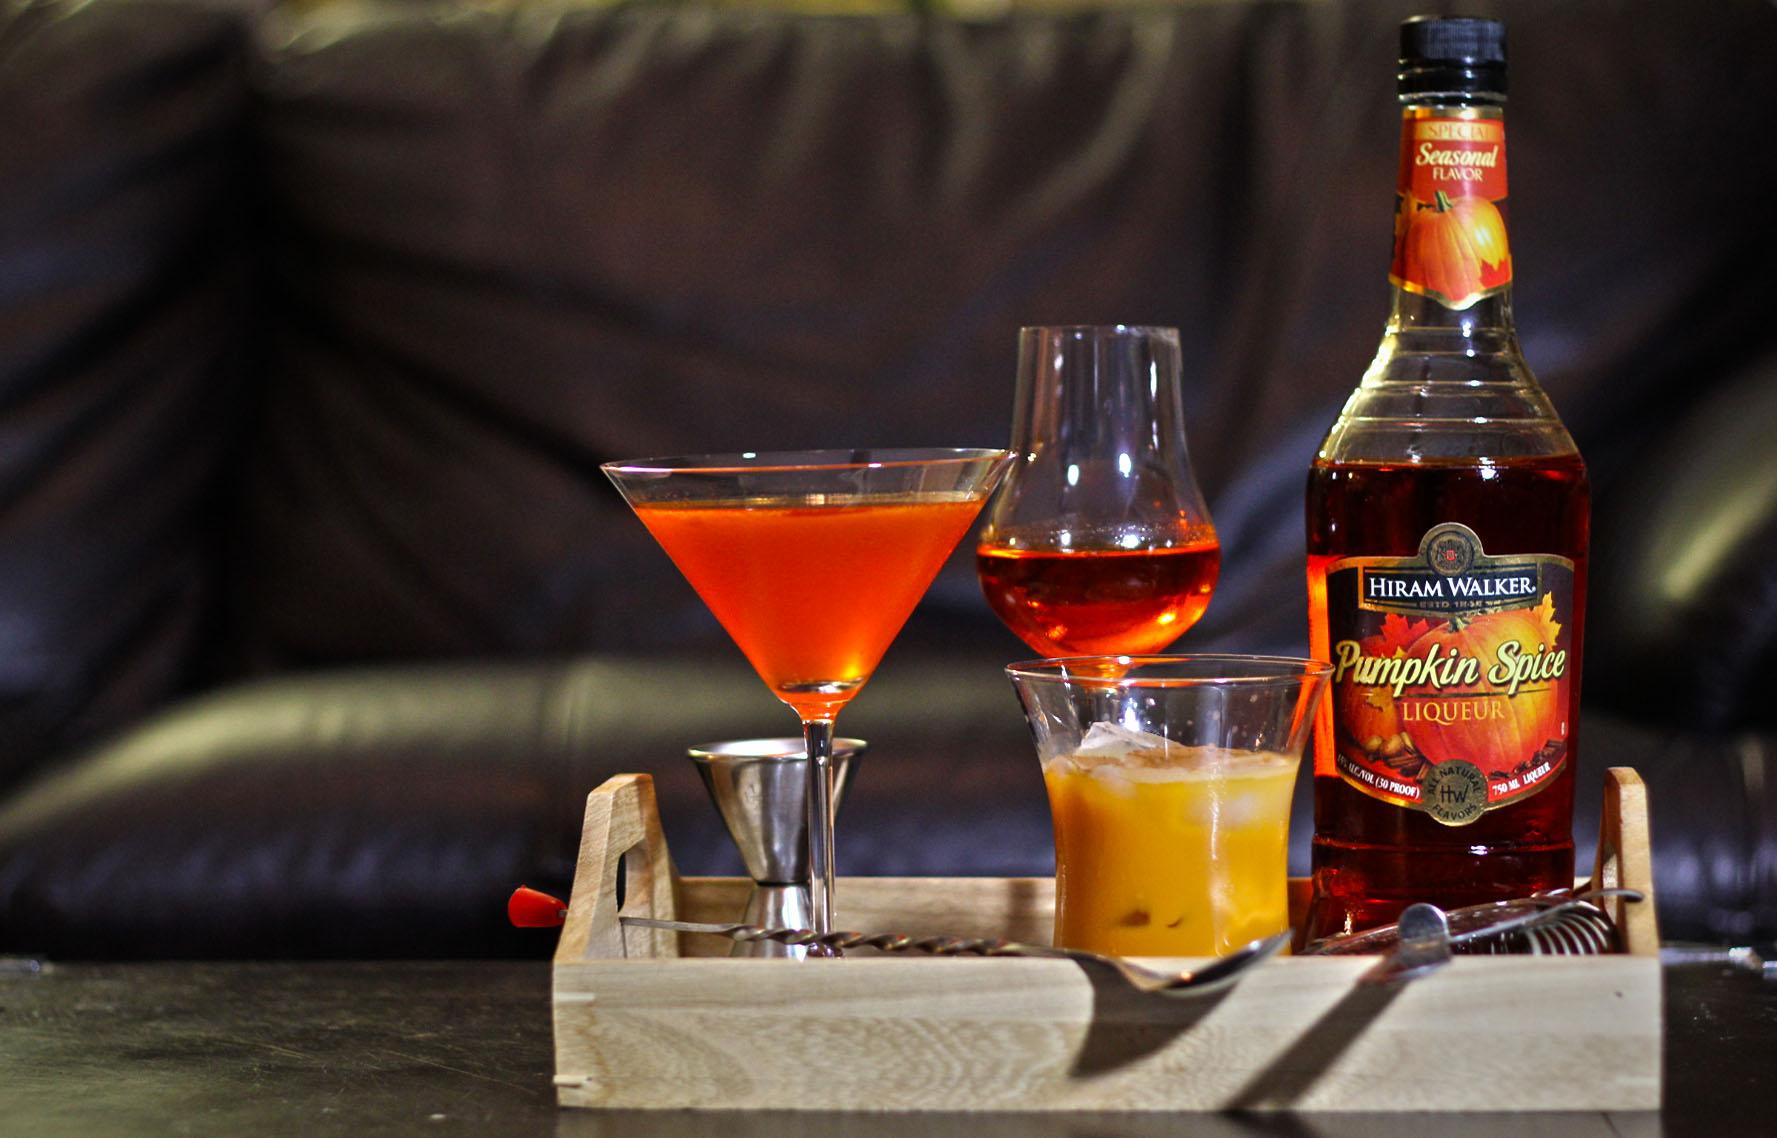 Hiram Walker Pumpkin Spice Liqueur – Pernod Ricard   The Great ...